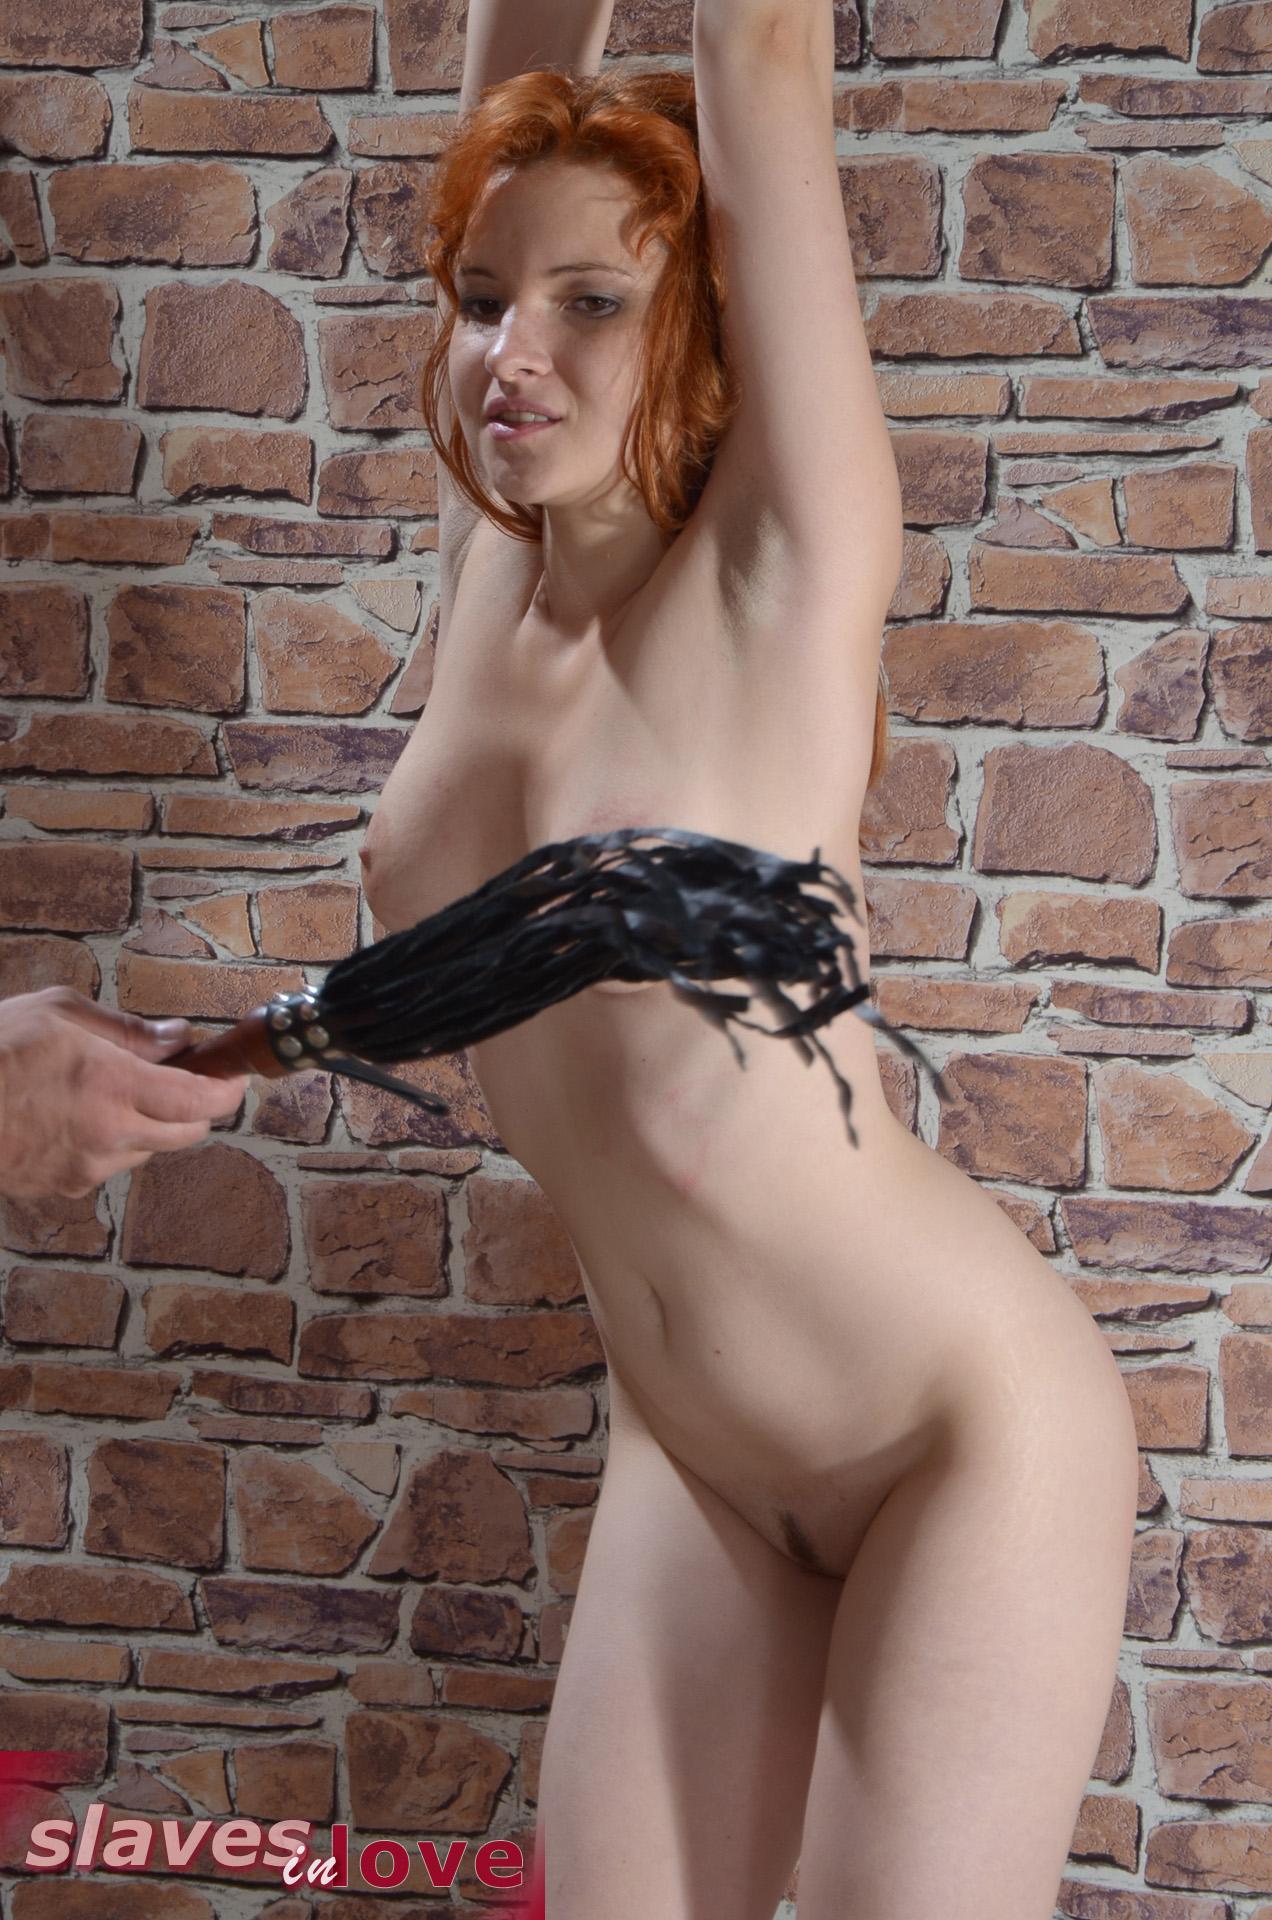 Patricia kennedy pornstar free photos